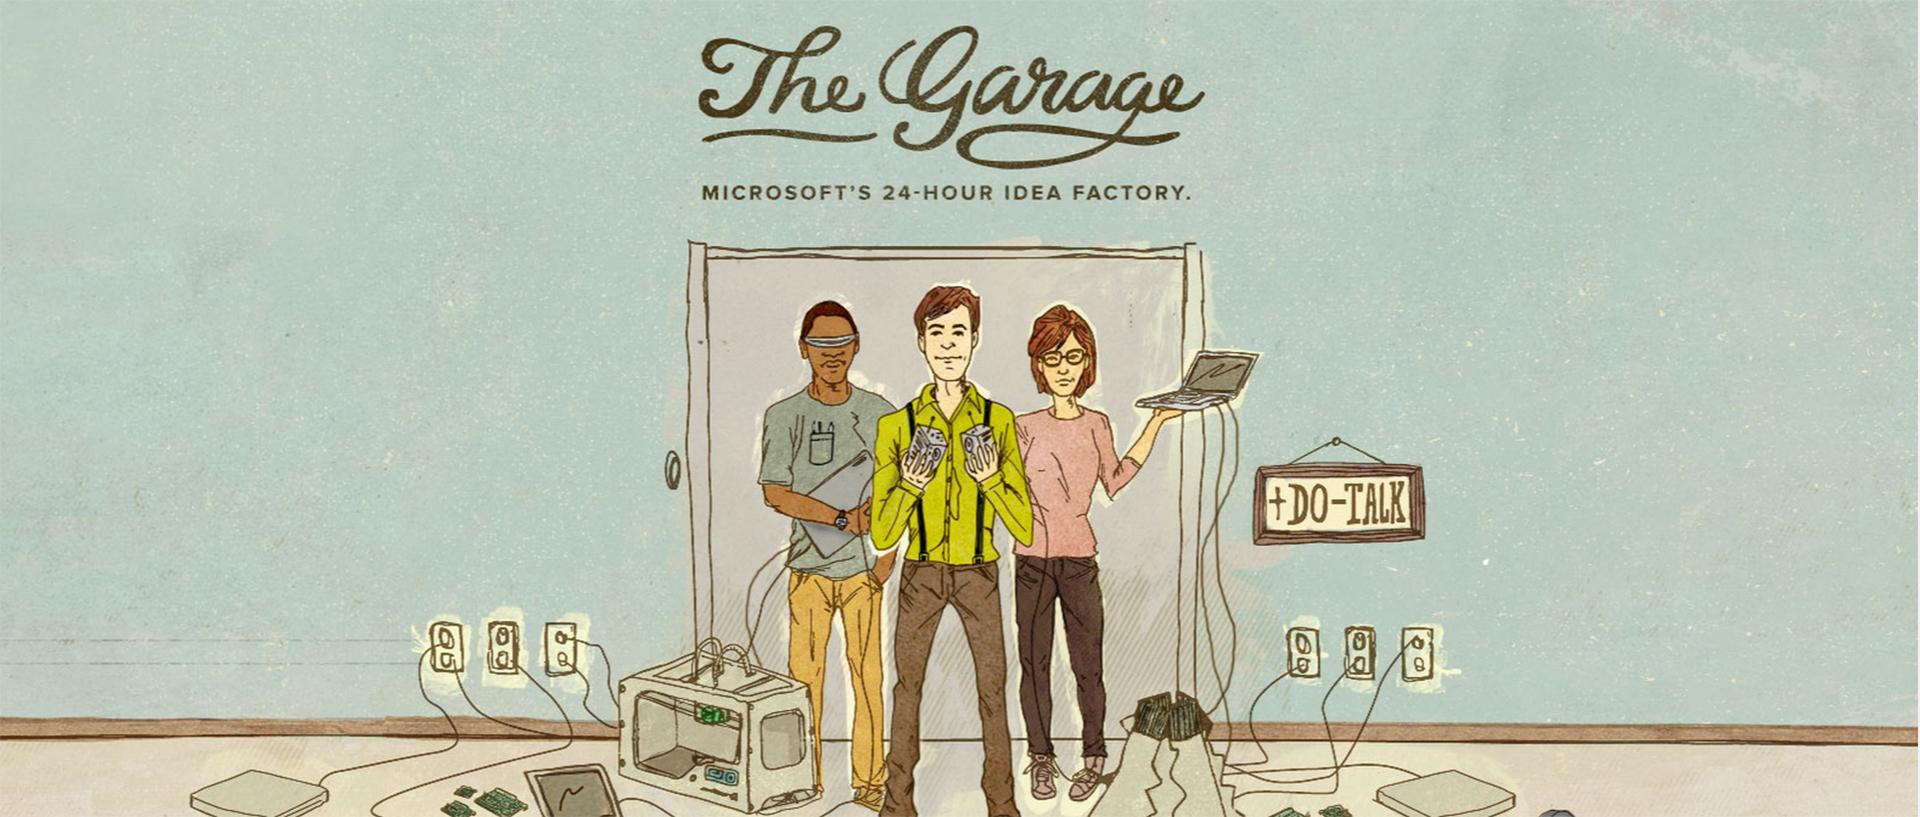 Microsoft's Garage